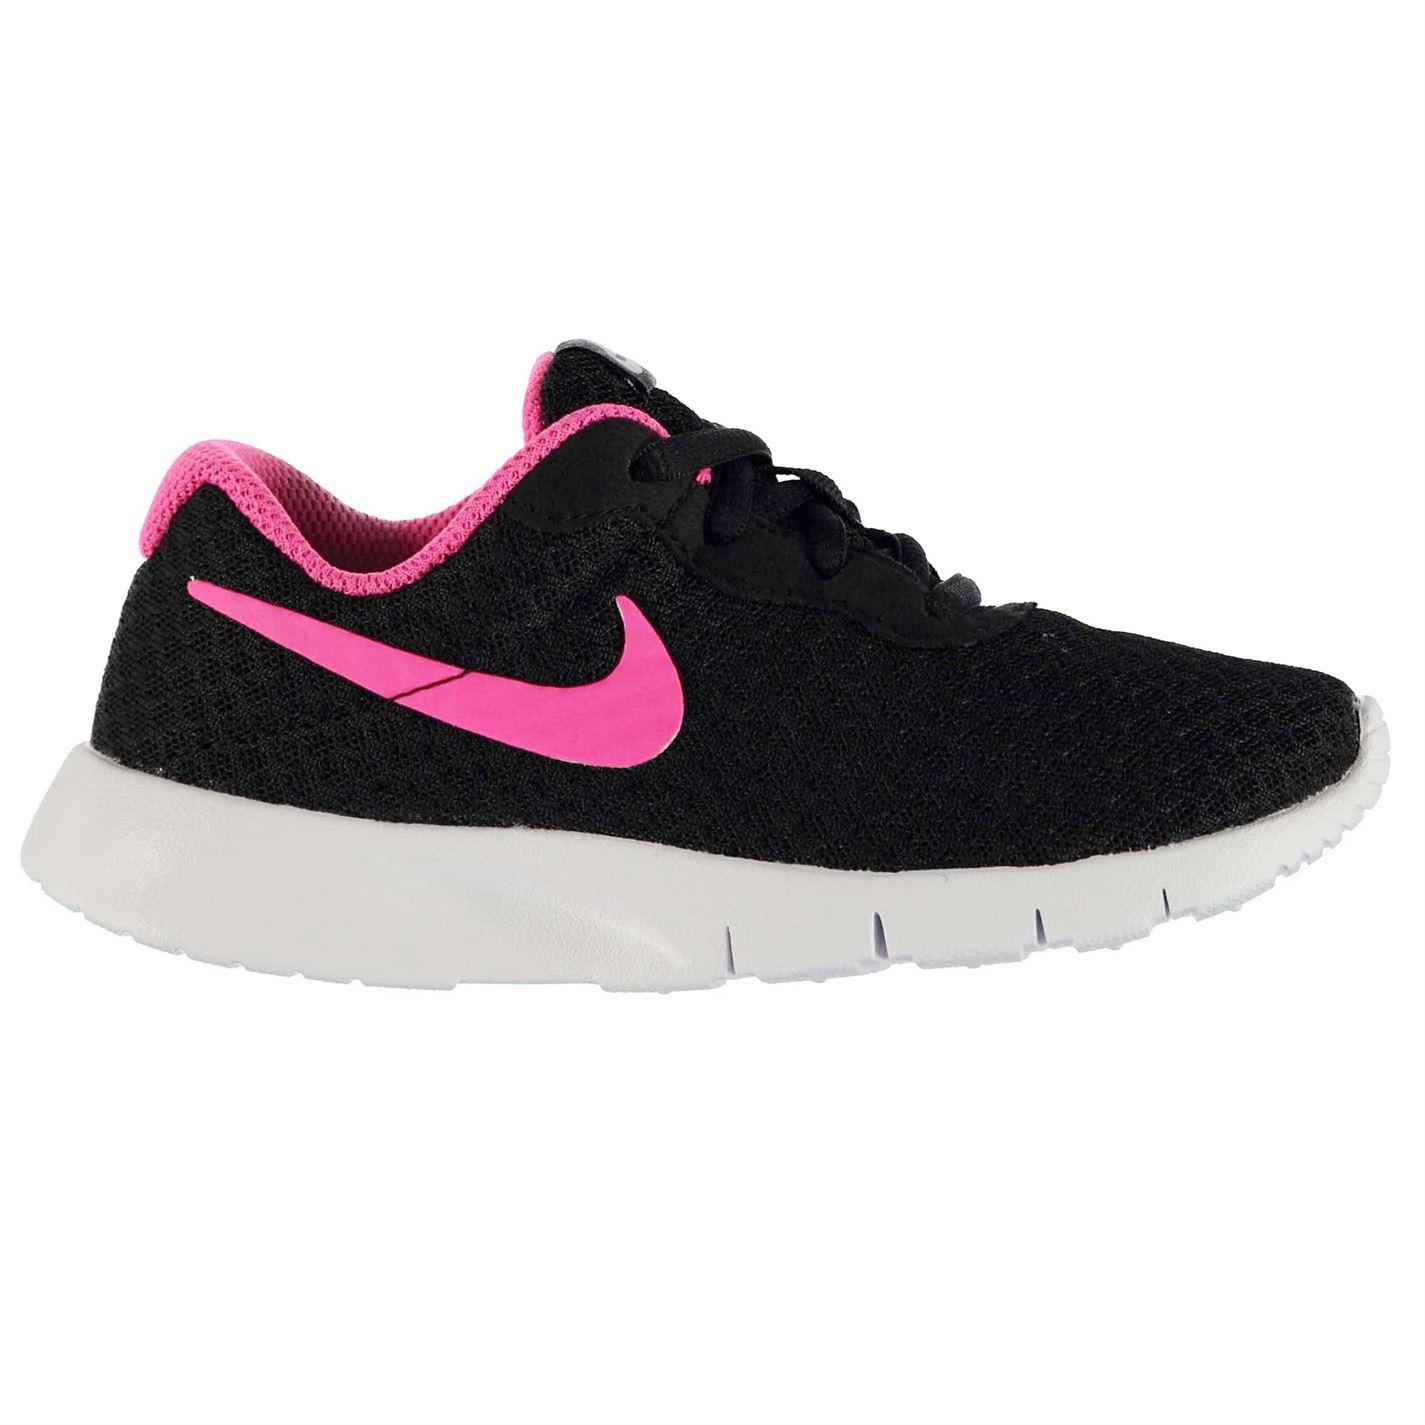 5d82bcb011c Tenisice Nike Tanjun Girls Trainers Roze - Jeftinije.hr